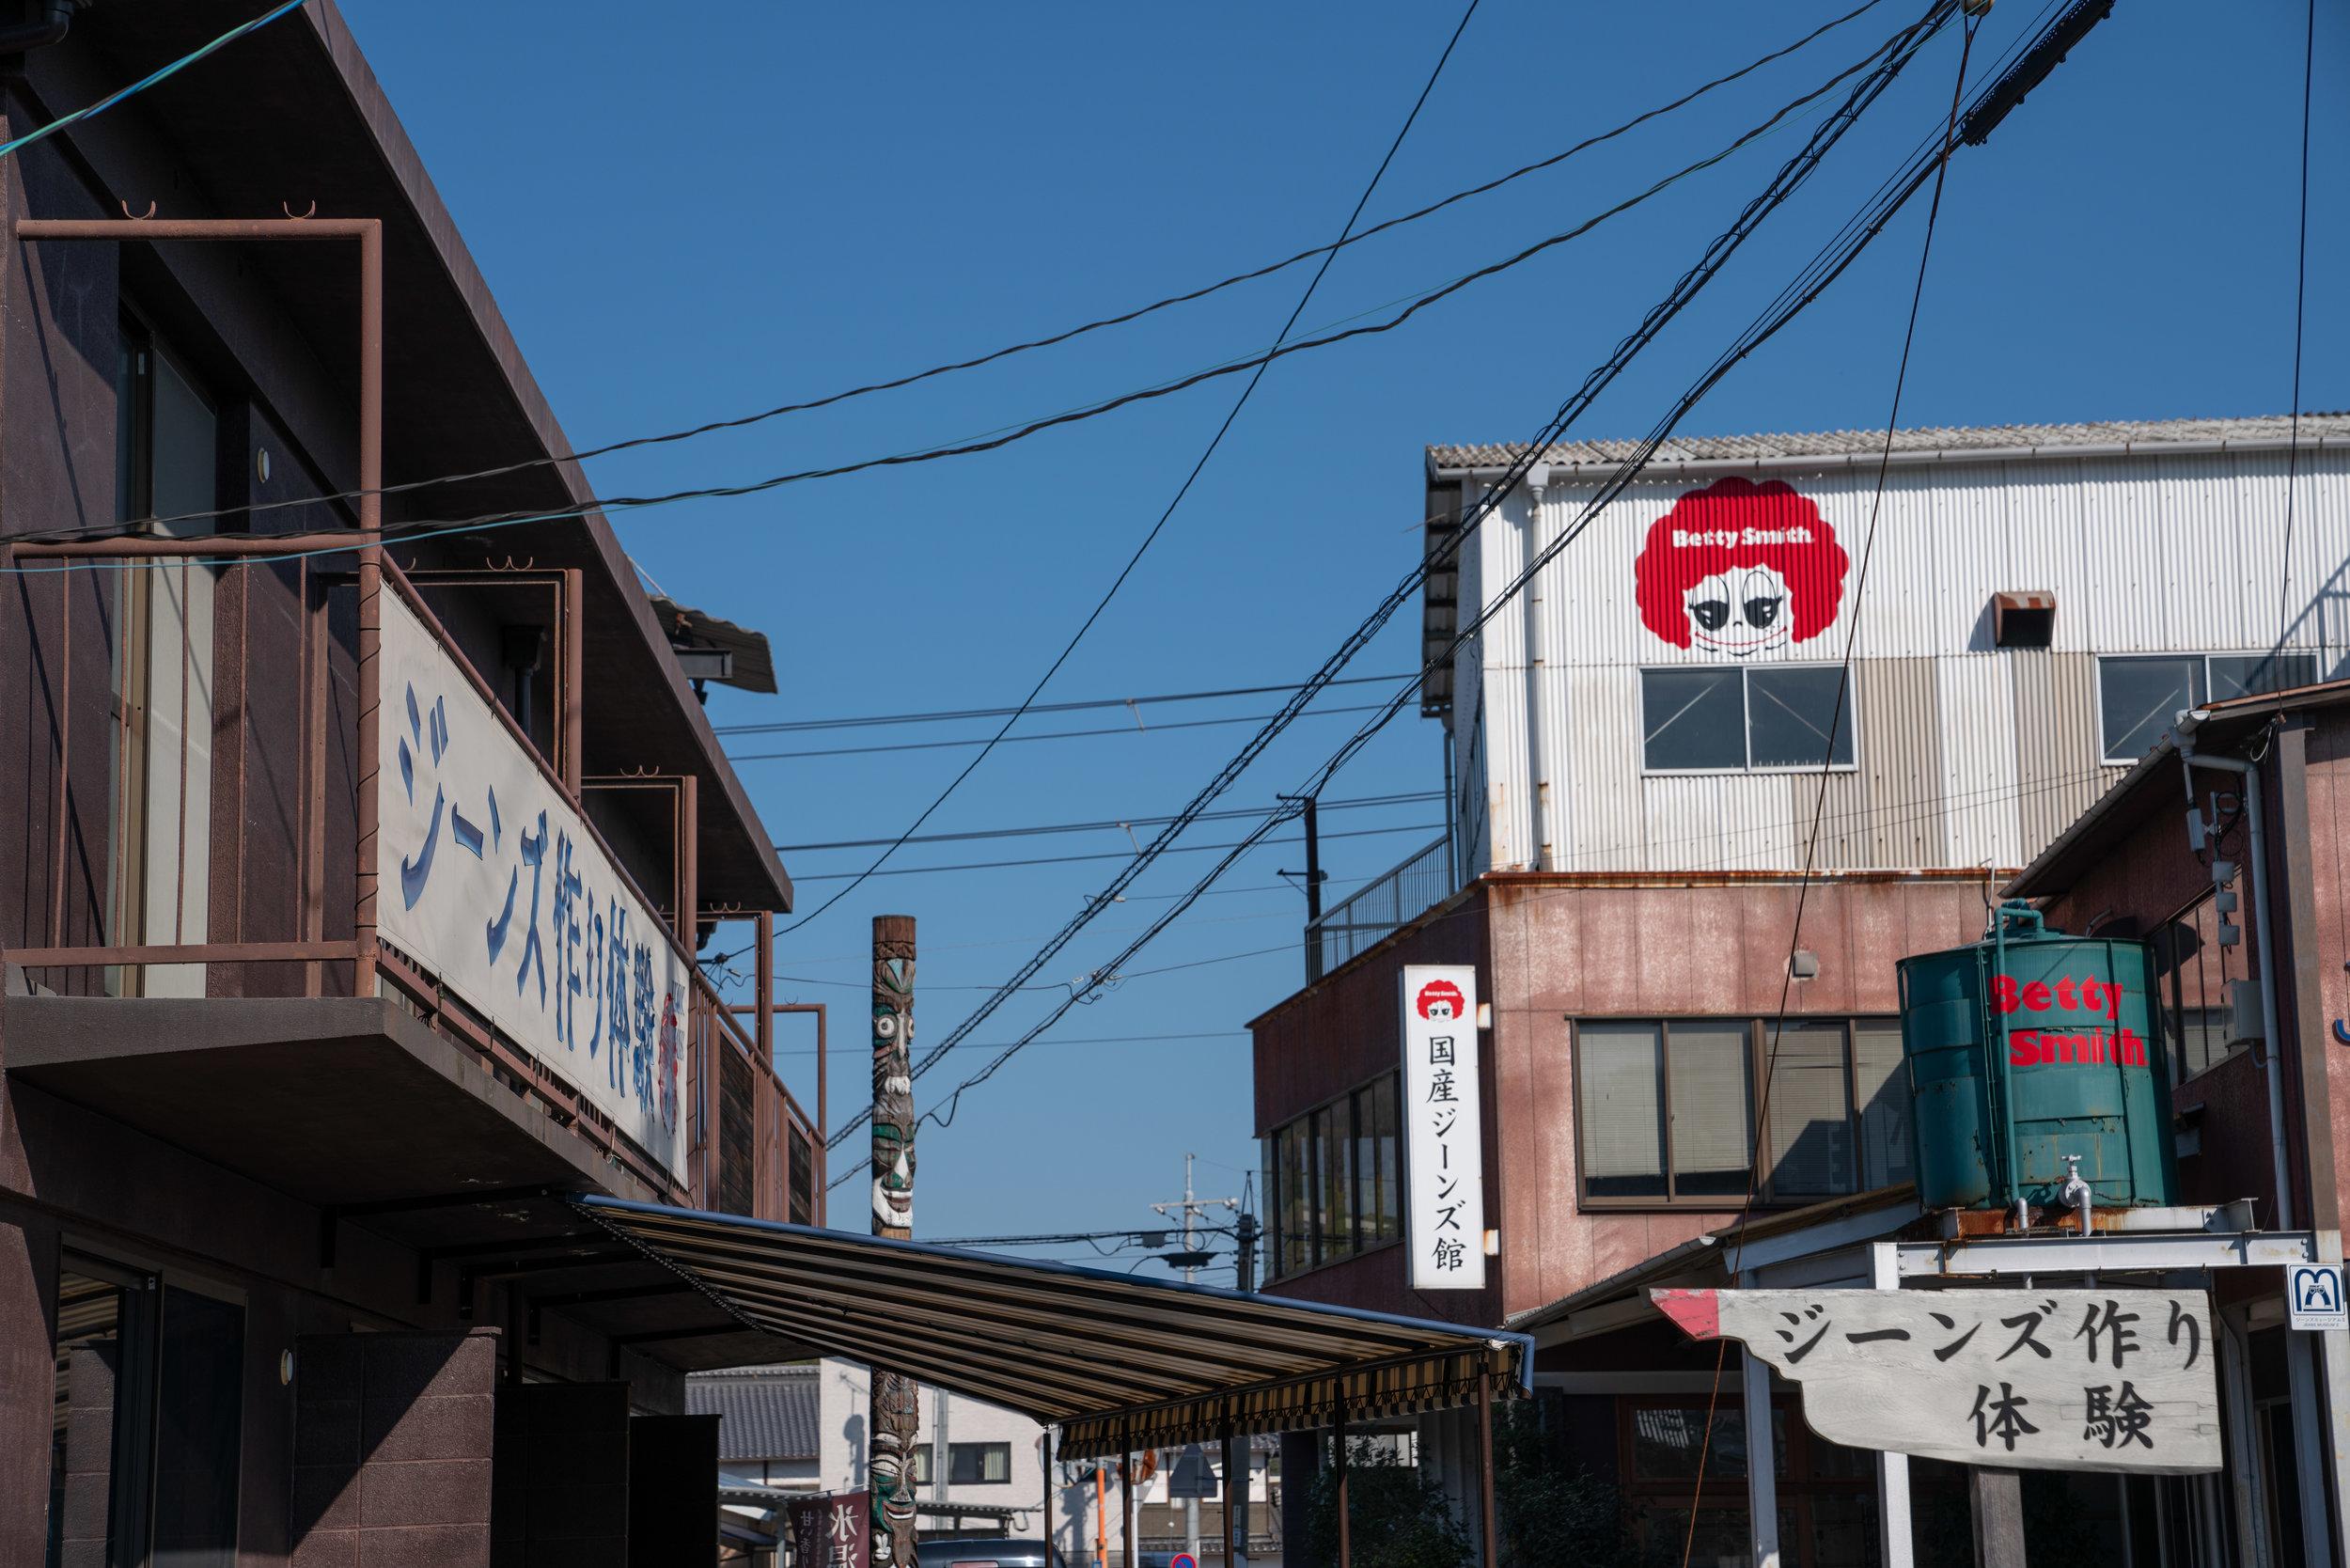 Kojima-Jeans-Street-CKS04346.jpg